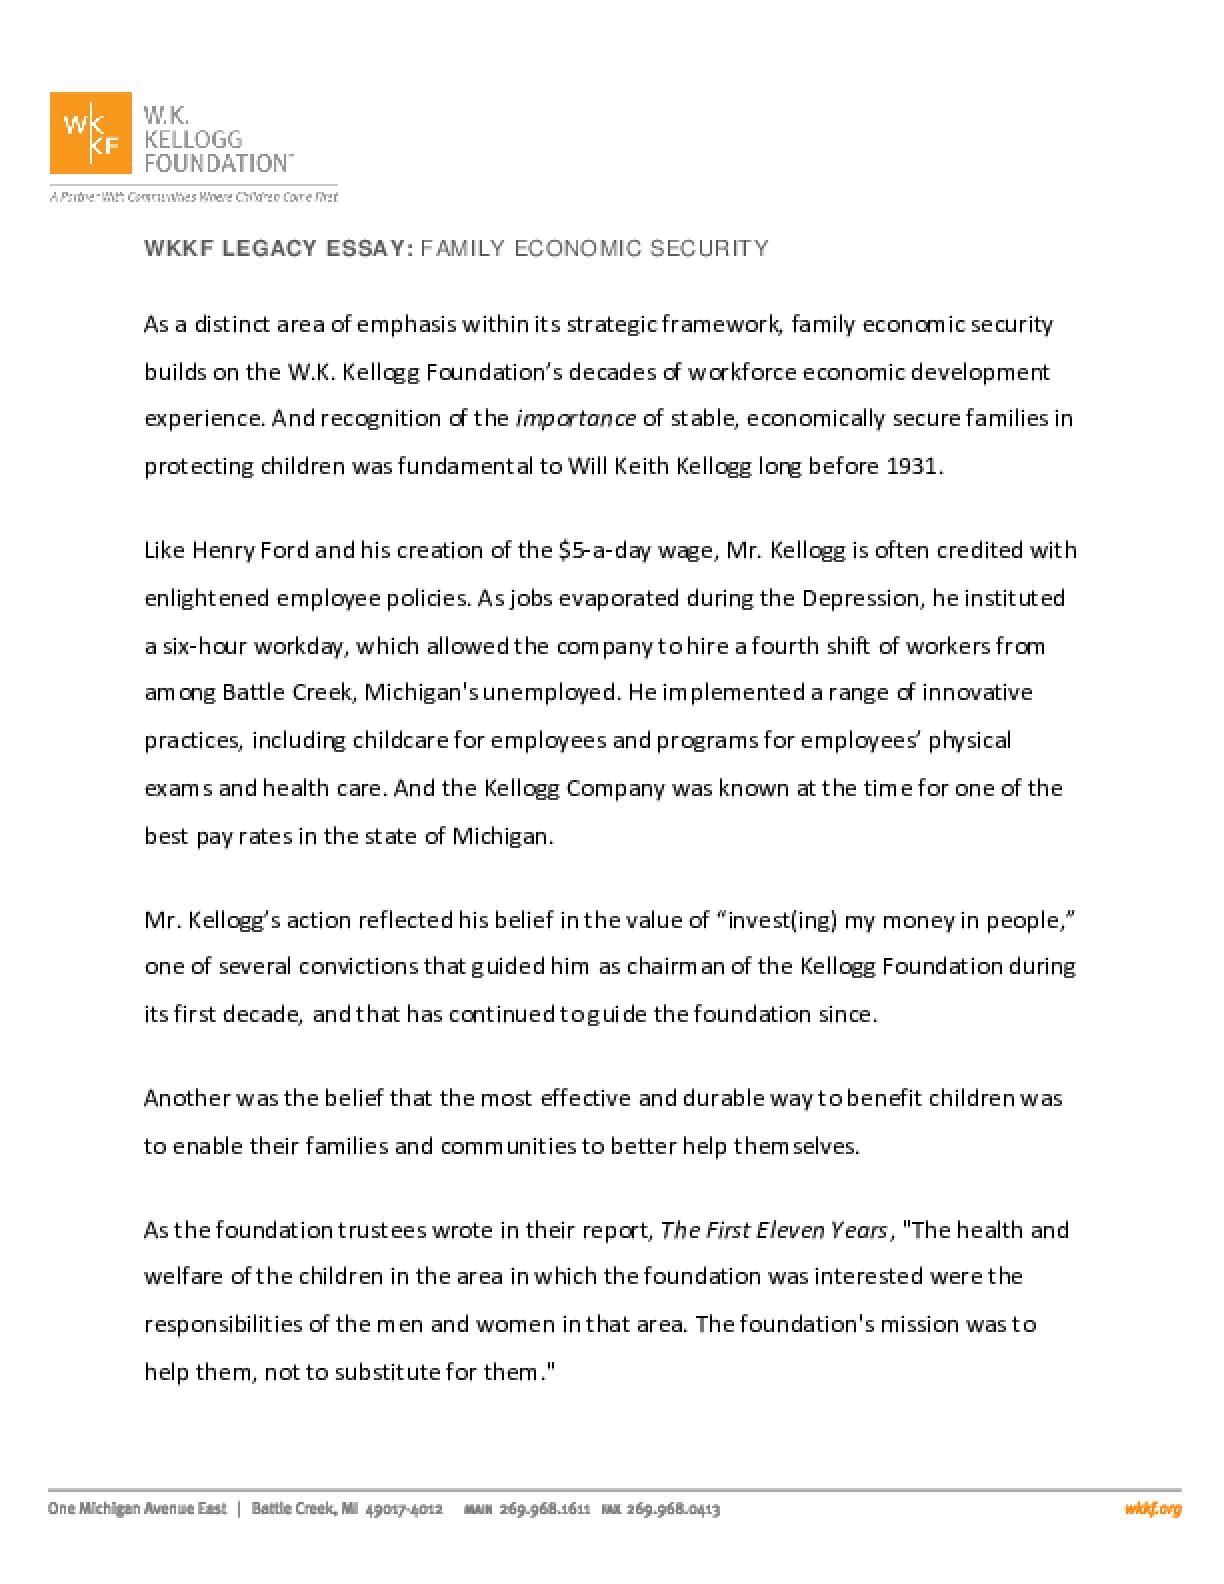 WKKF Legacy Essay: Family Economic Security